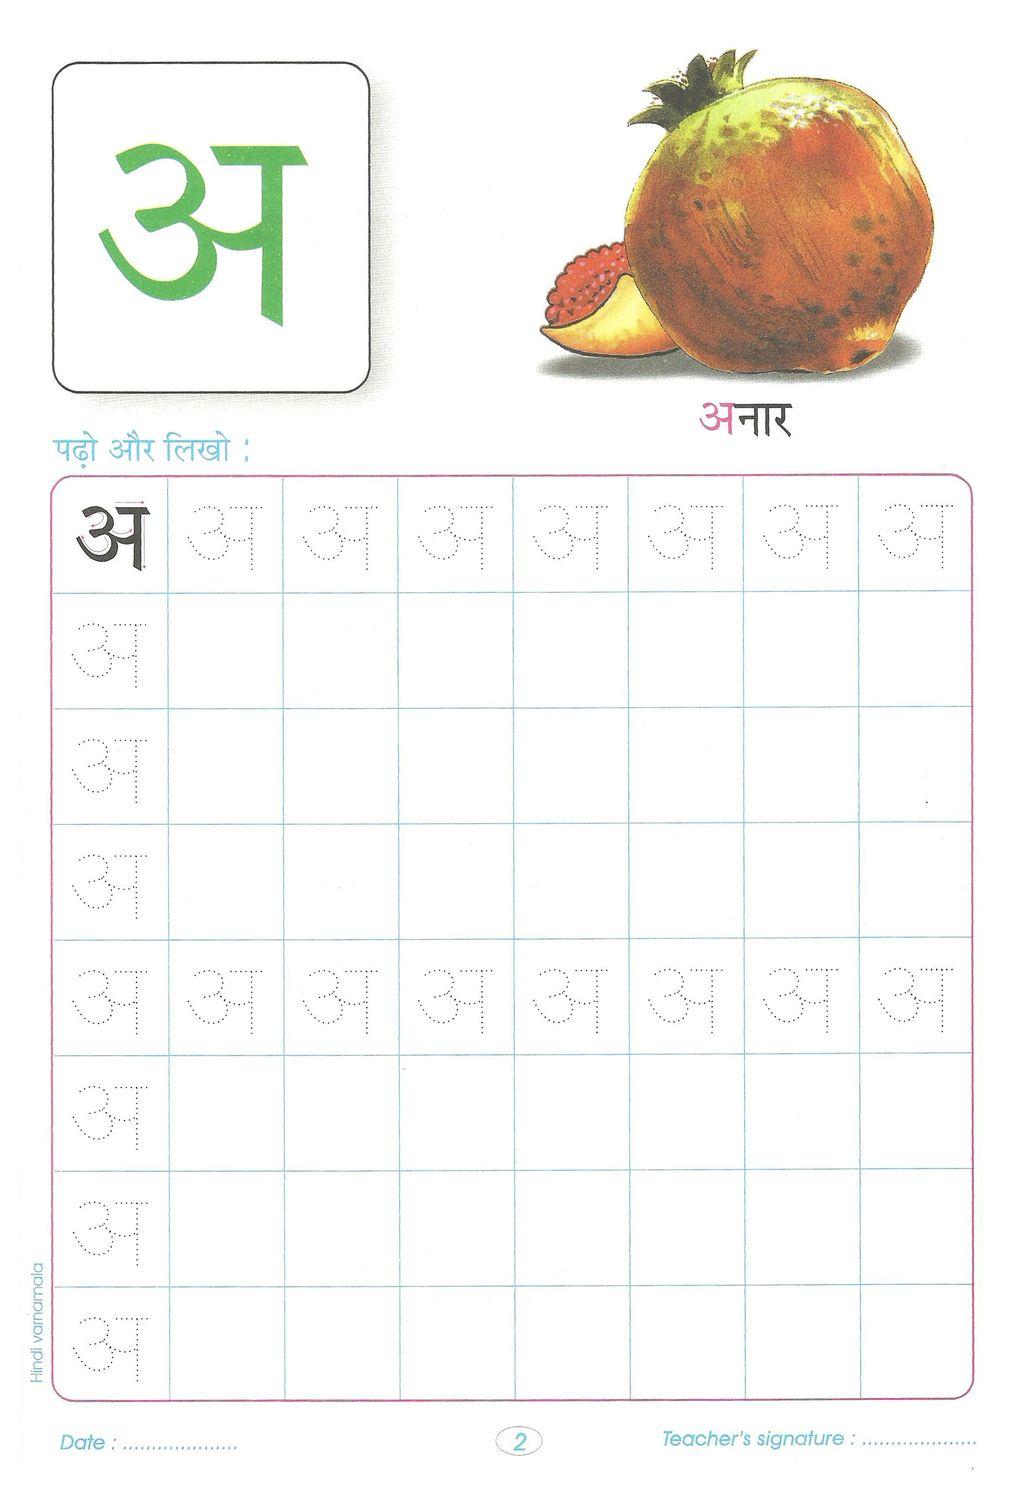 IndiaPass: Indiai óvoda